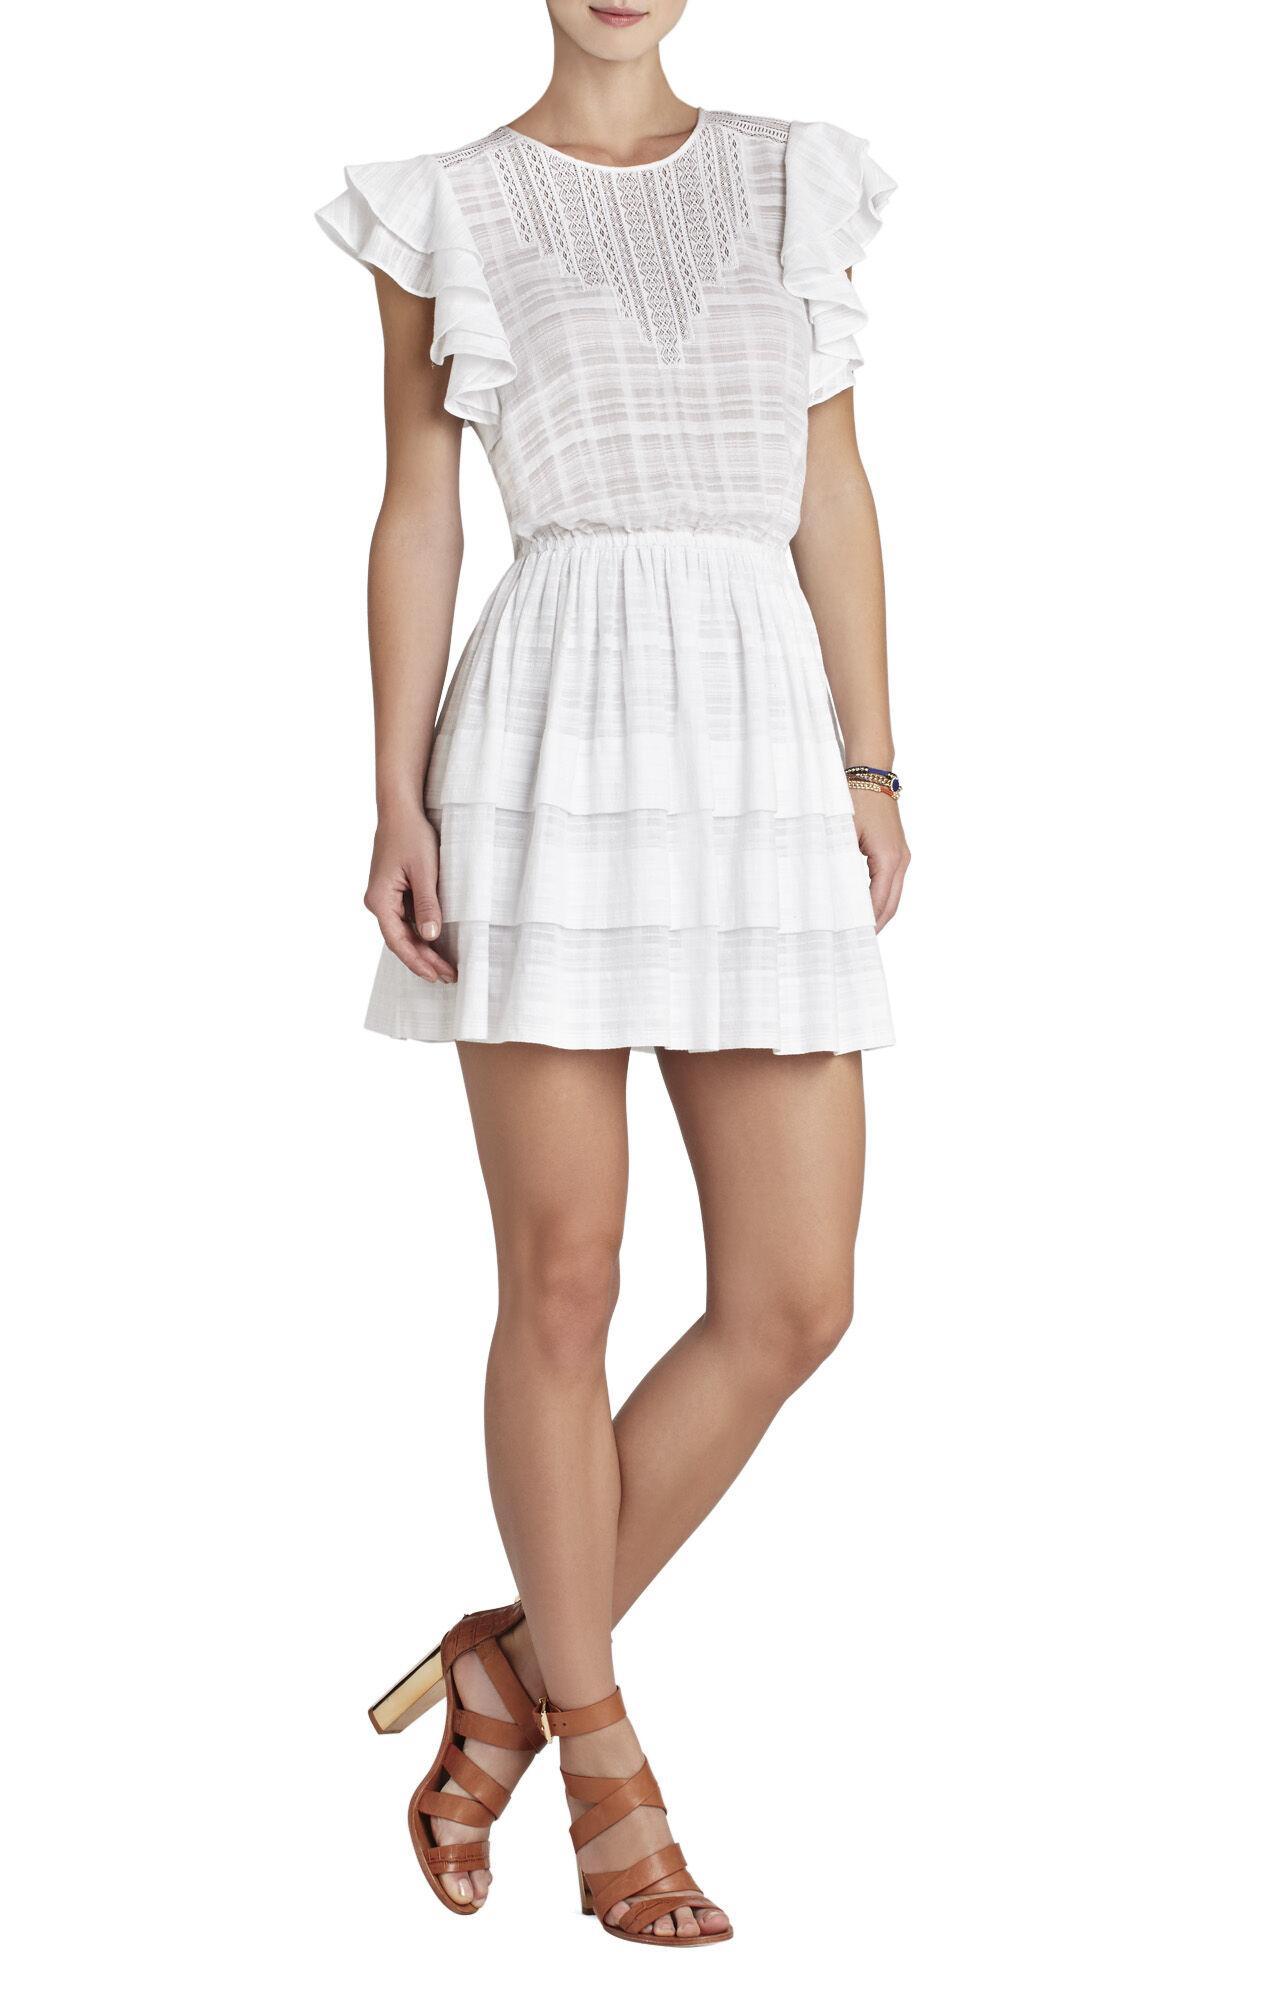 Joice Sleeveless Pleated-Skirt Dress